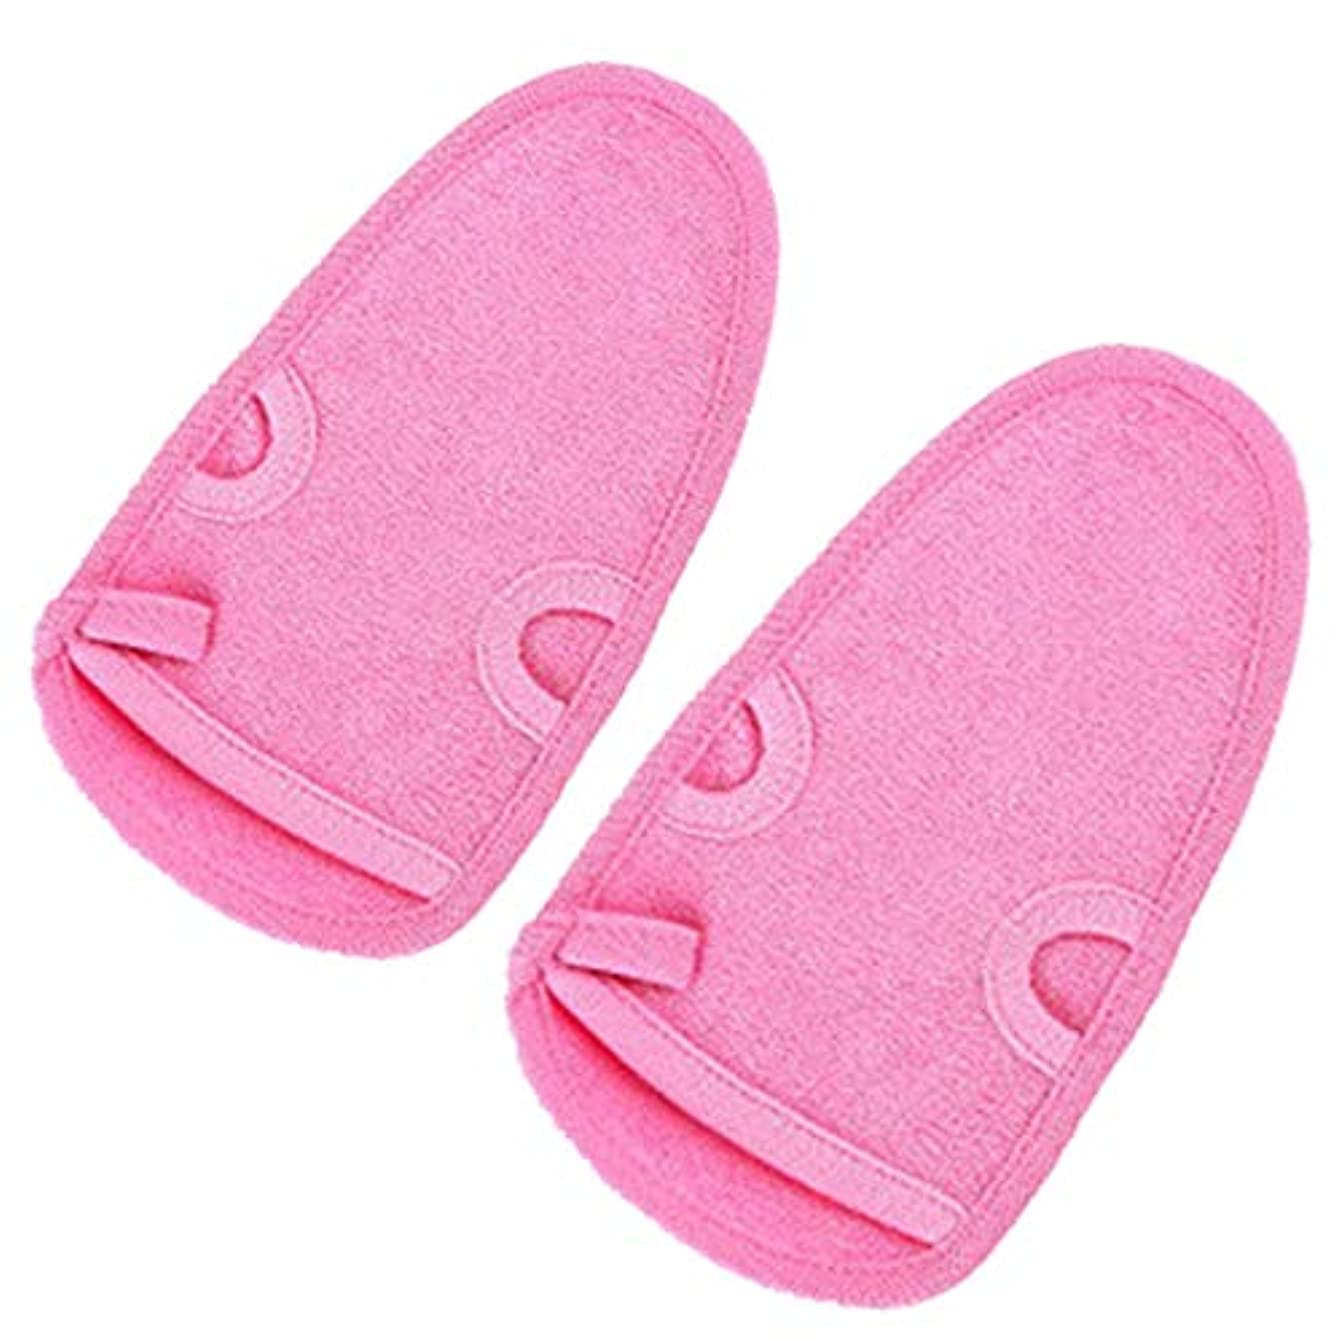 Kingsie 浴用手袋 2個セット あかすりミトン ボディ手袋 ボディタオル シャワーグローブ 入浴用品 毛穴清潔 角質除去 男女兼用 (ピンク)